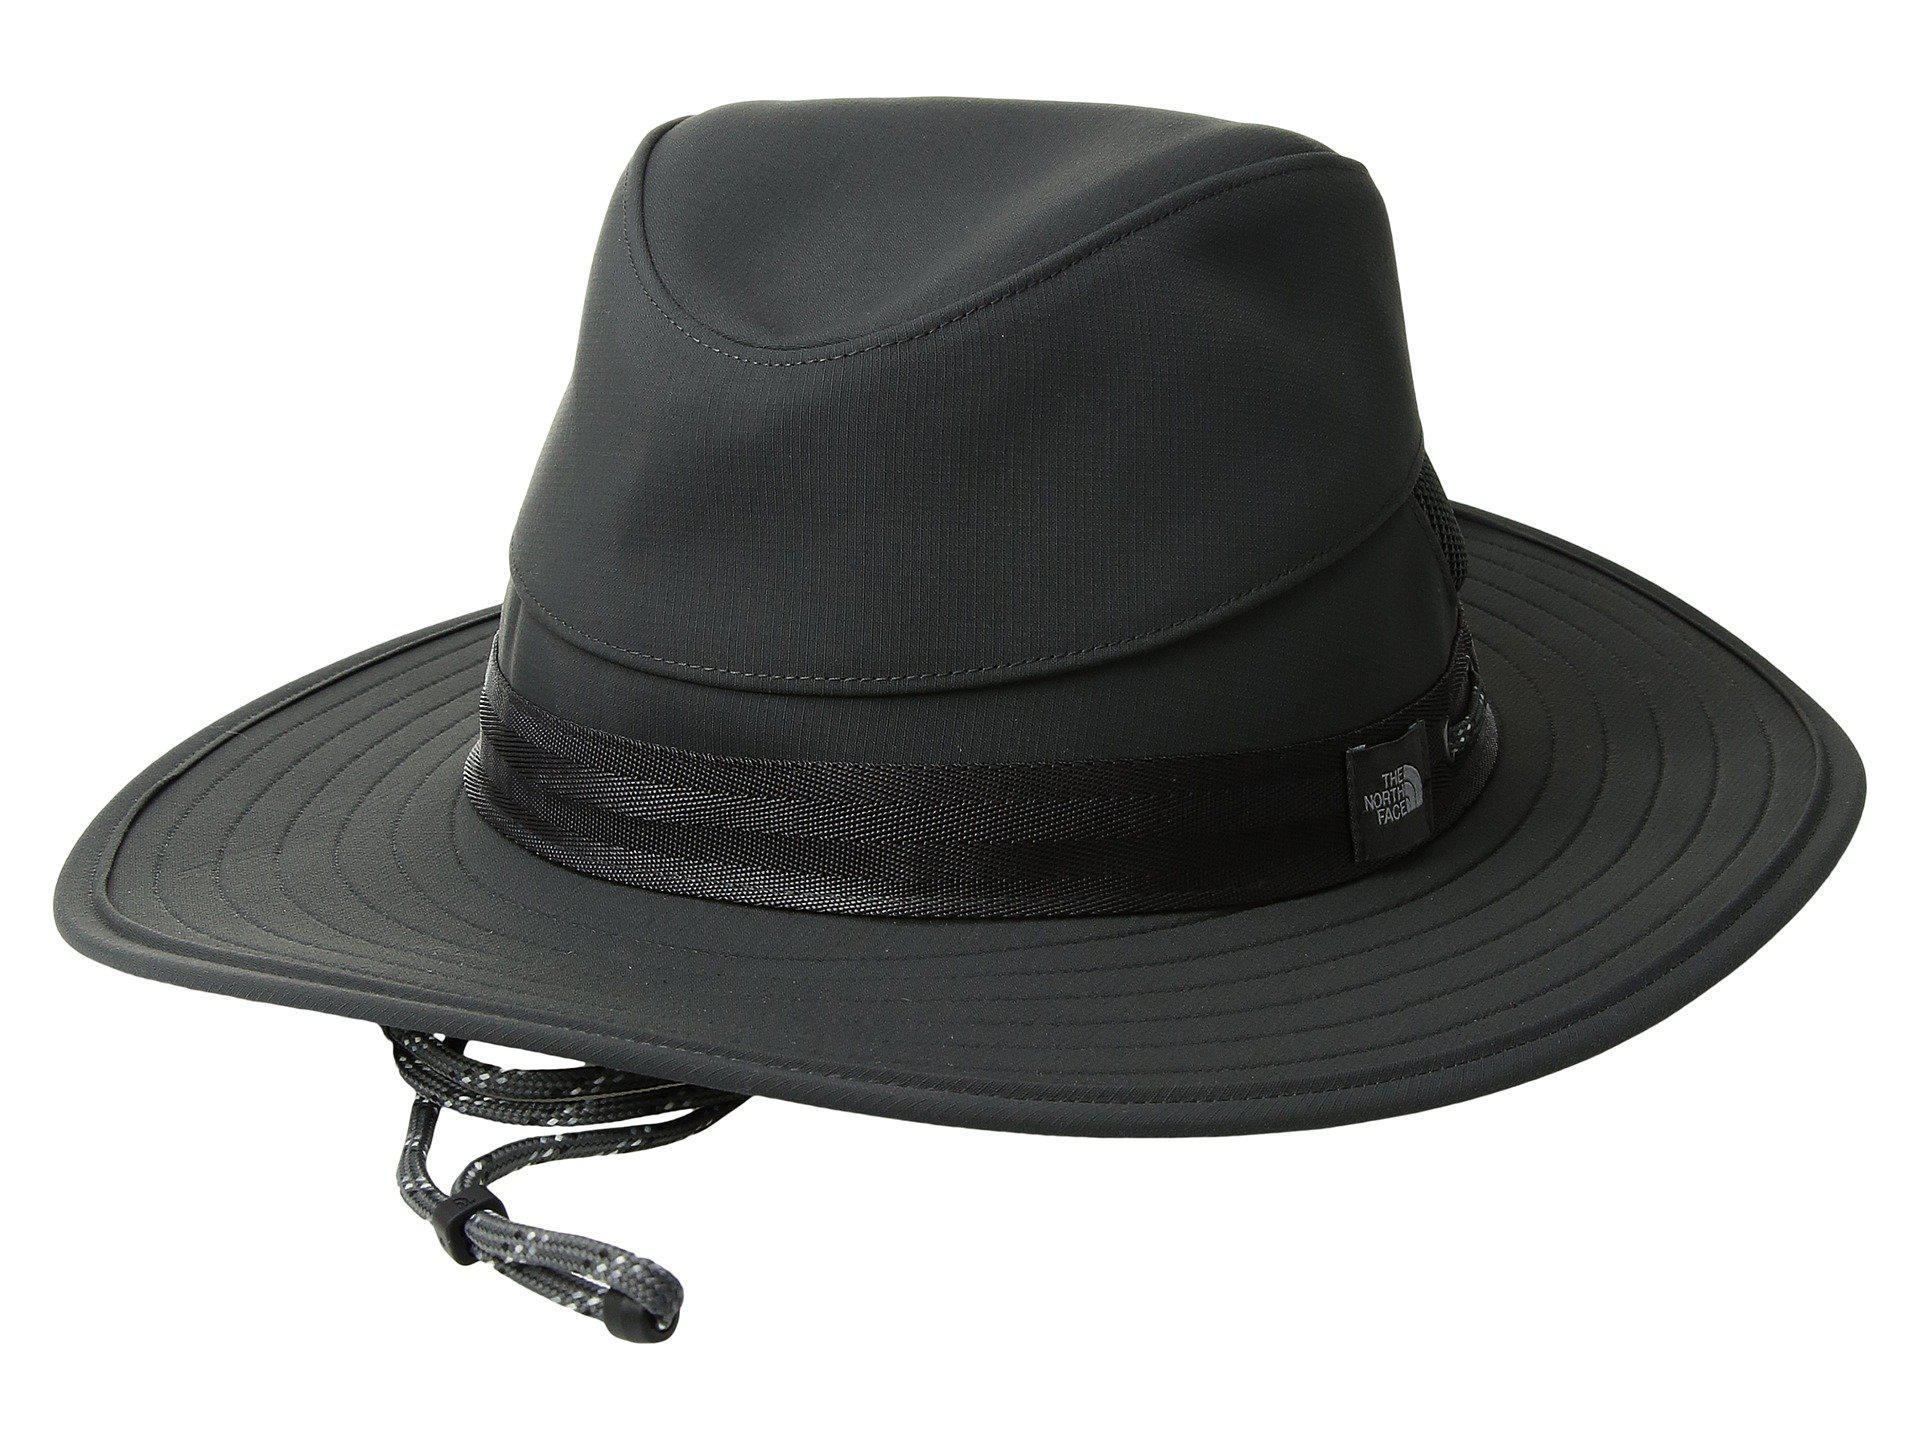 3ec55b853da Lyst - The North Face Shadowcaster Hat (weimaraner Brown asphalt ...